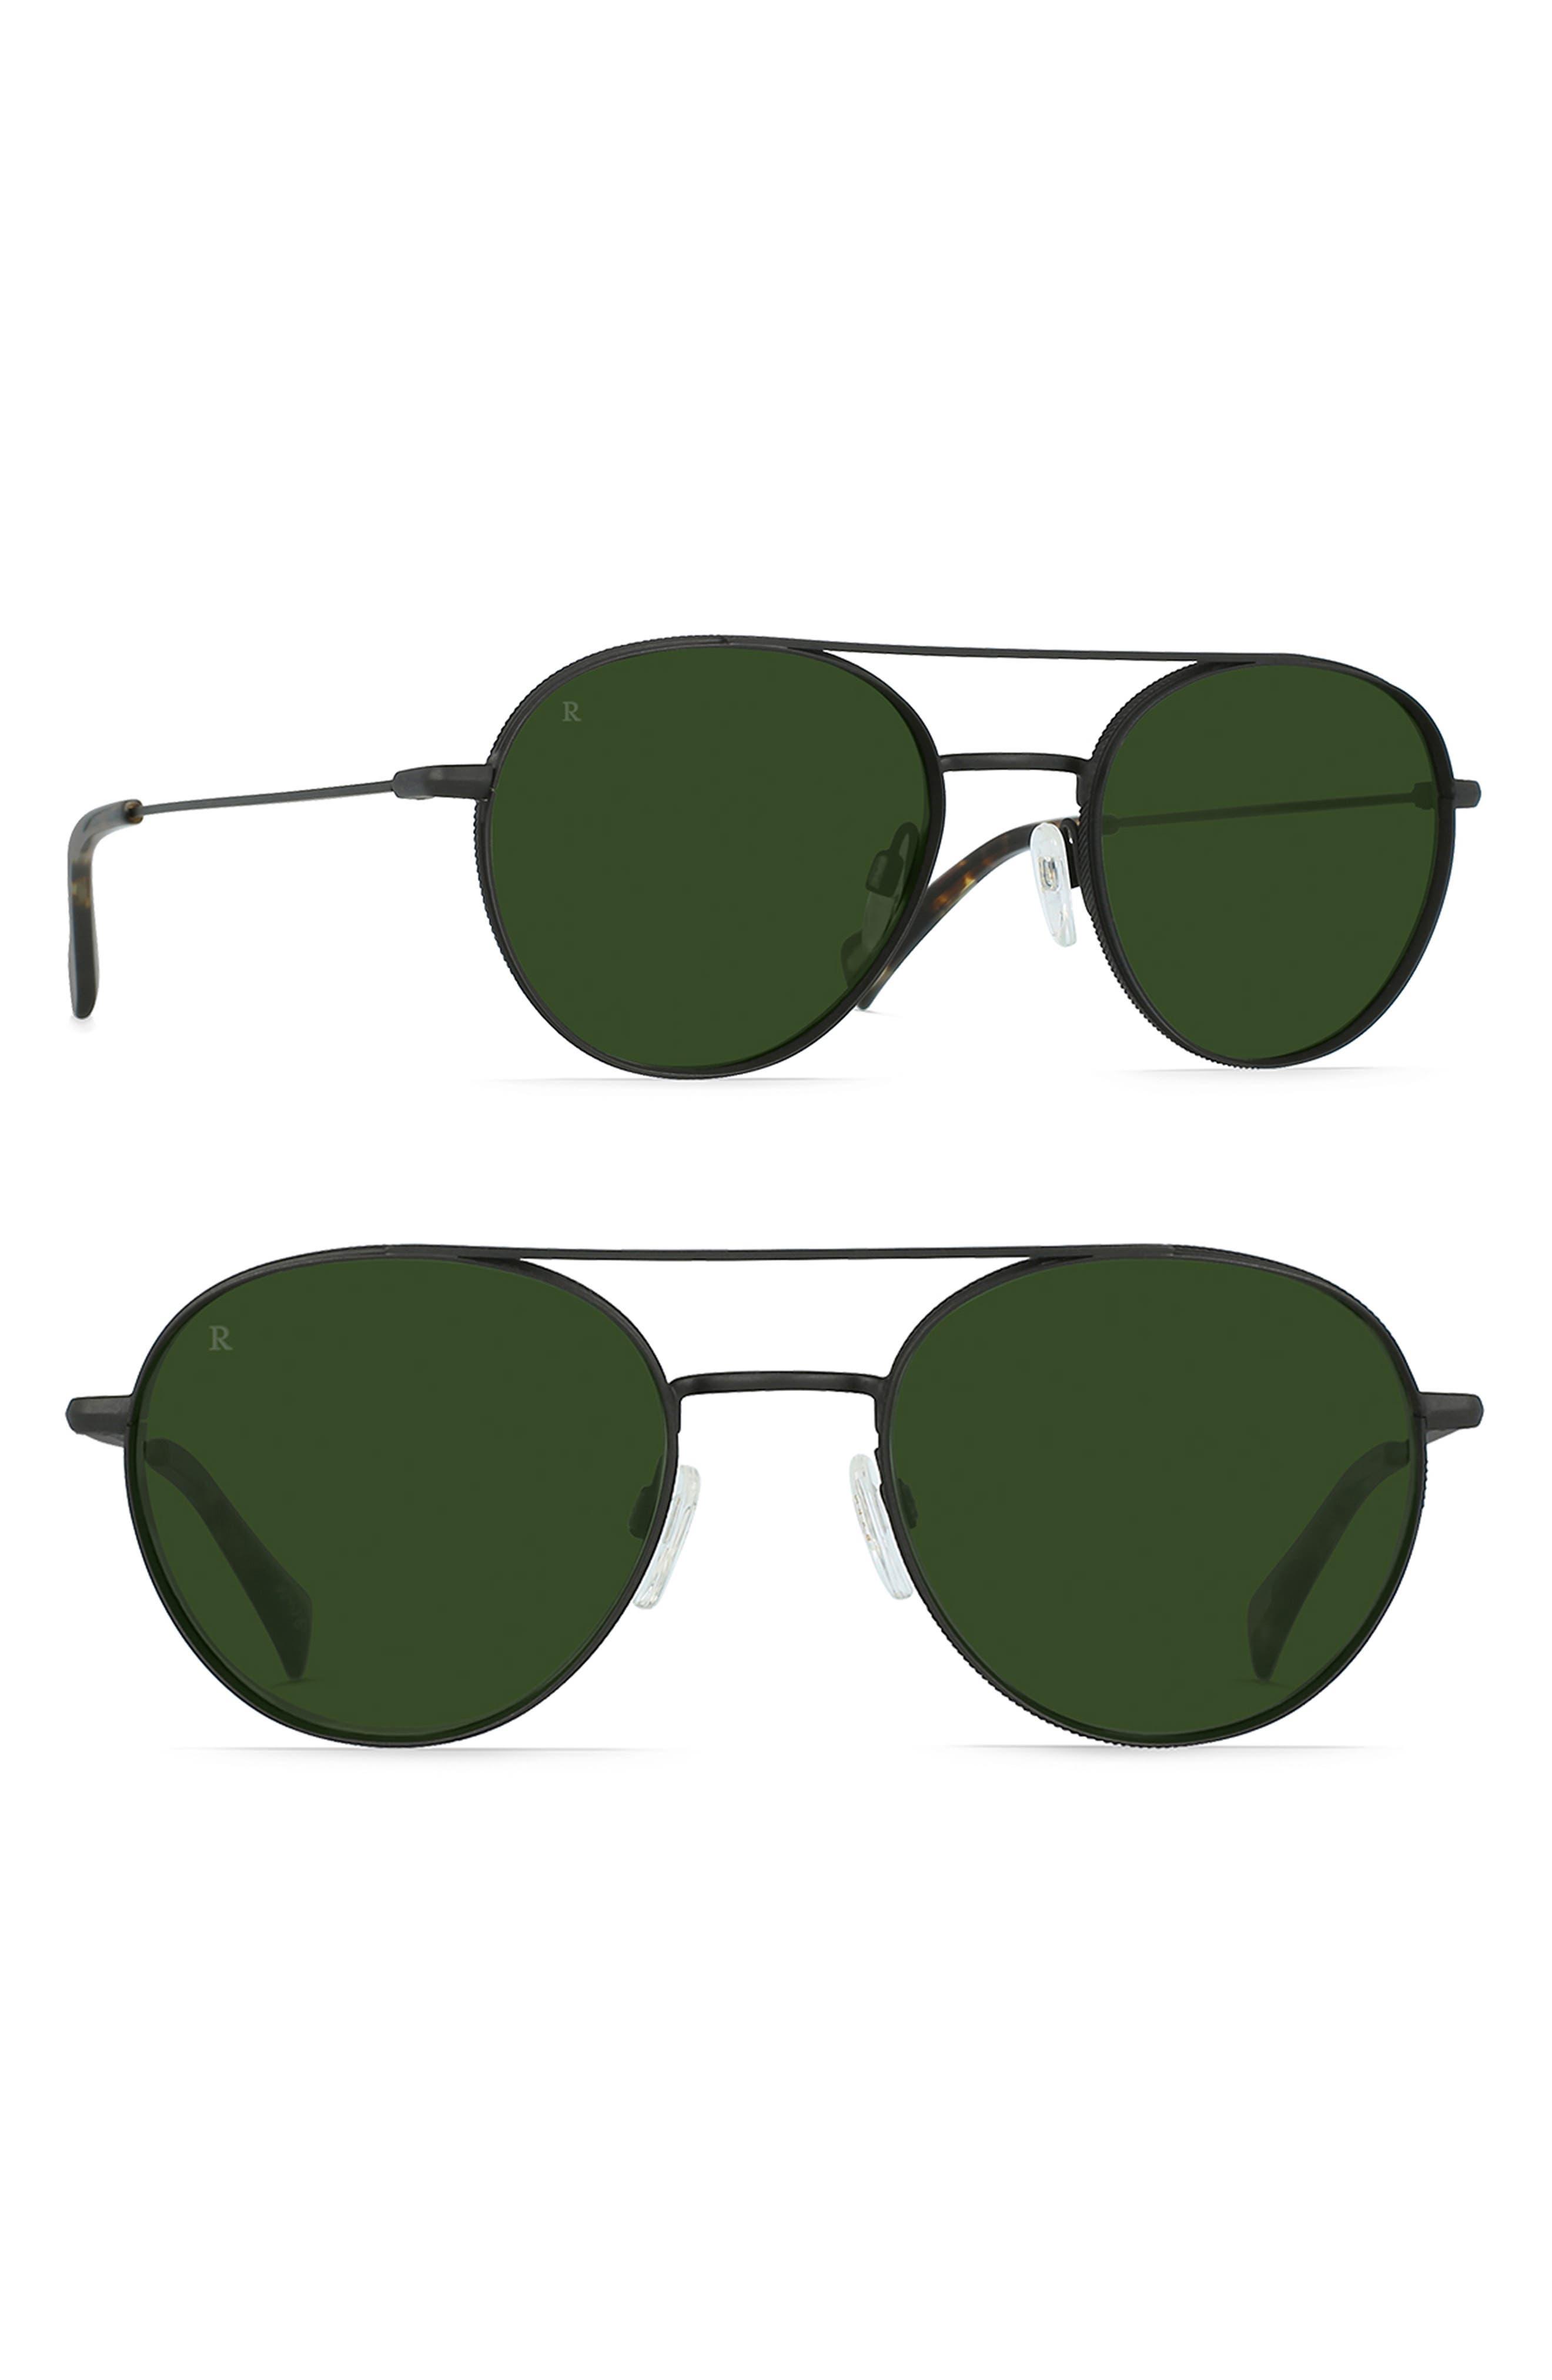 RAEN Aliso 51Mm Sunglasses - Black/ Brindle/ Bottle Green